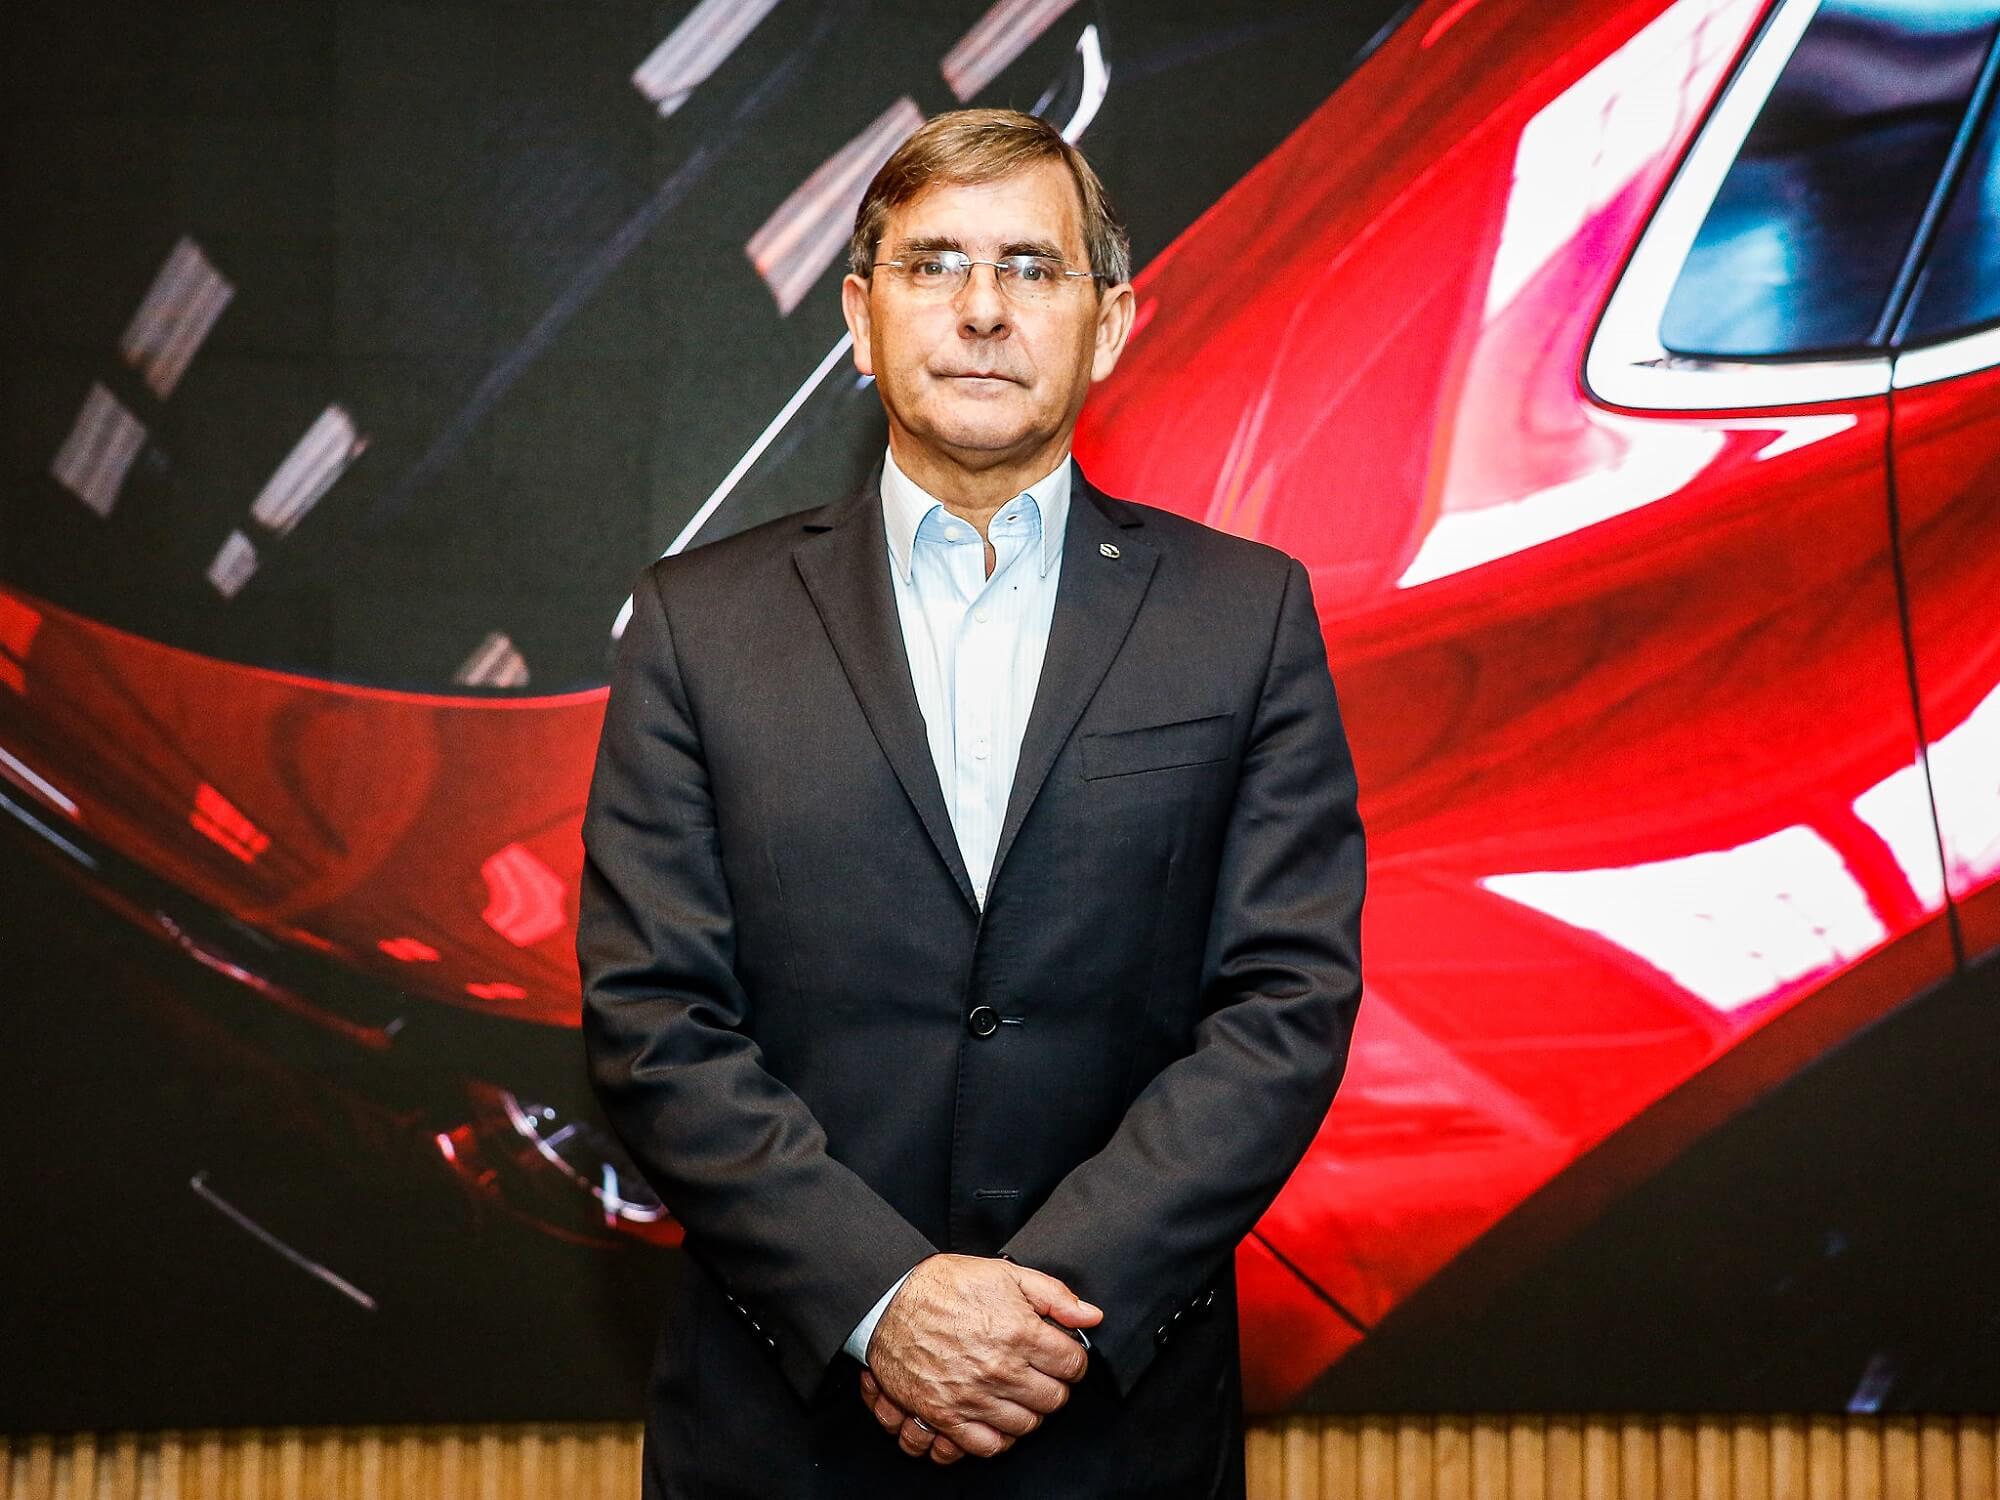 Luis Morais Mazda Portugal